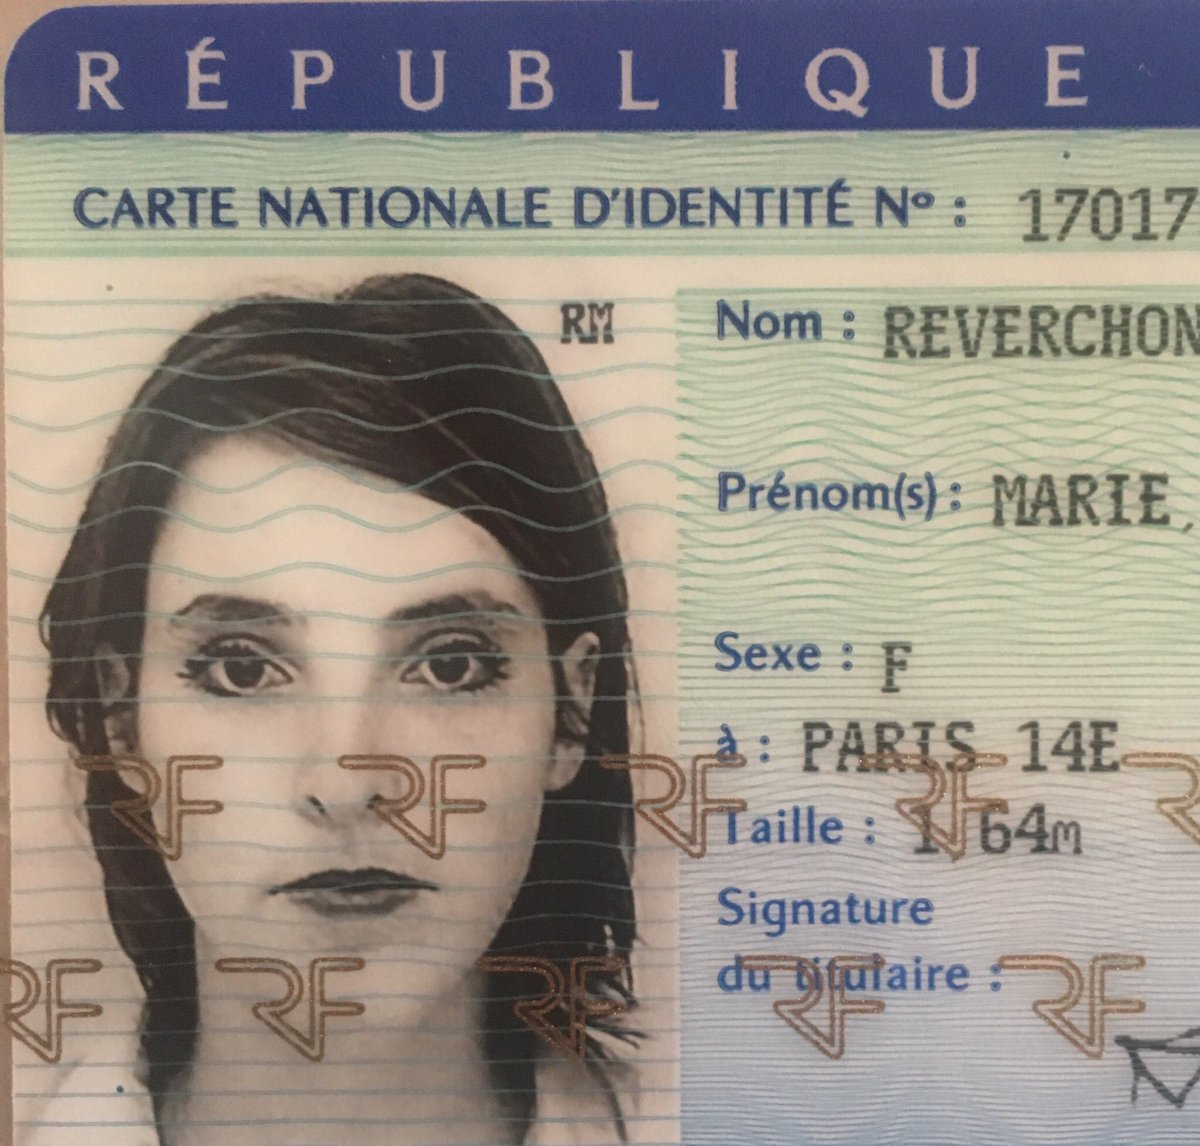 perdu carte d identité FVuillod14 on Twitter: